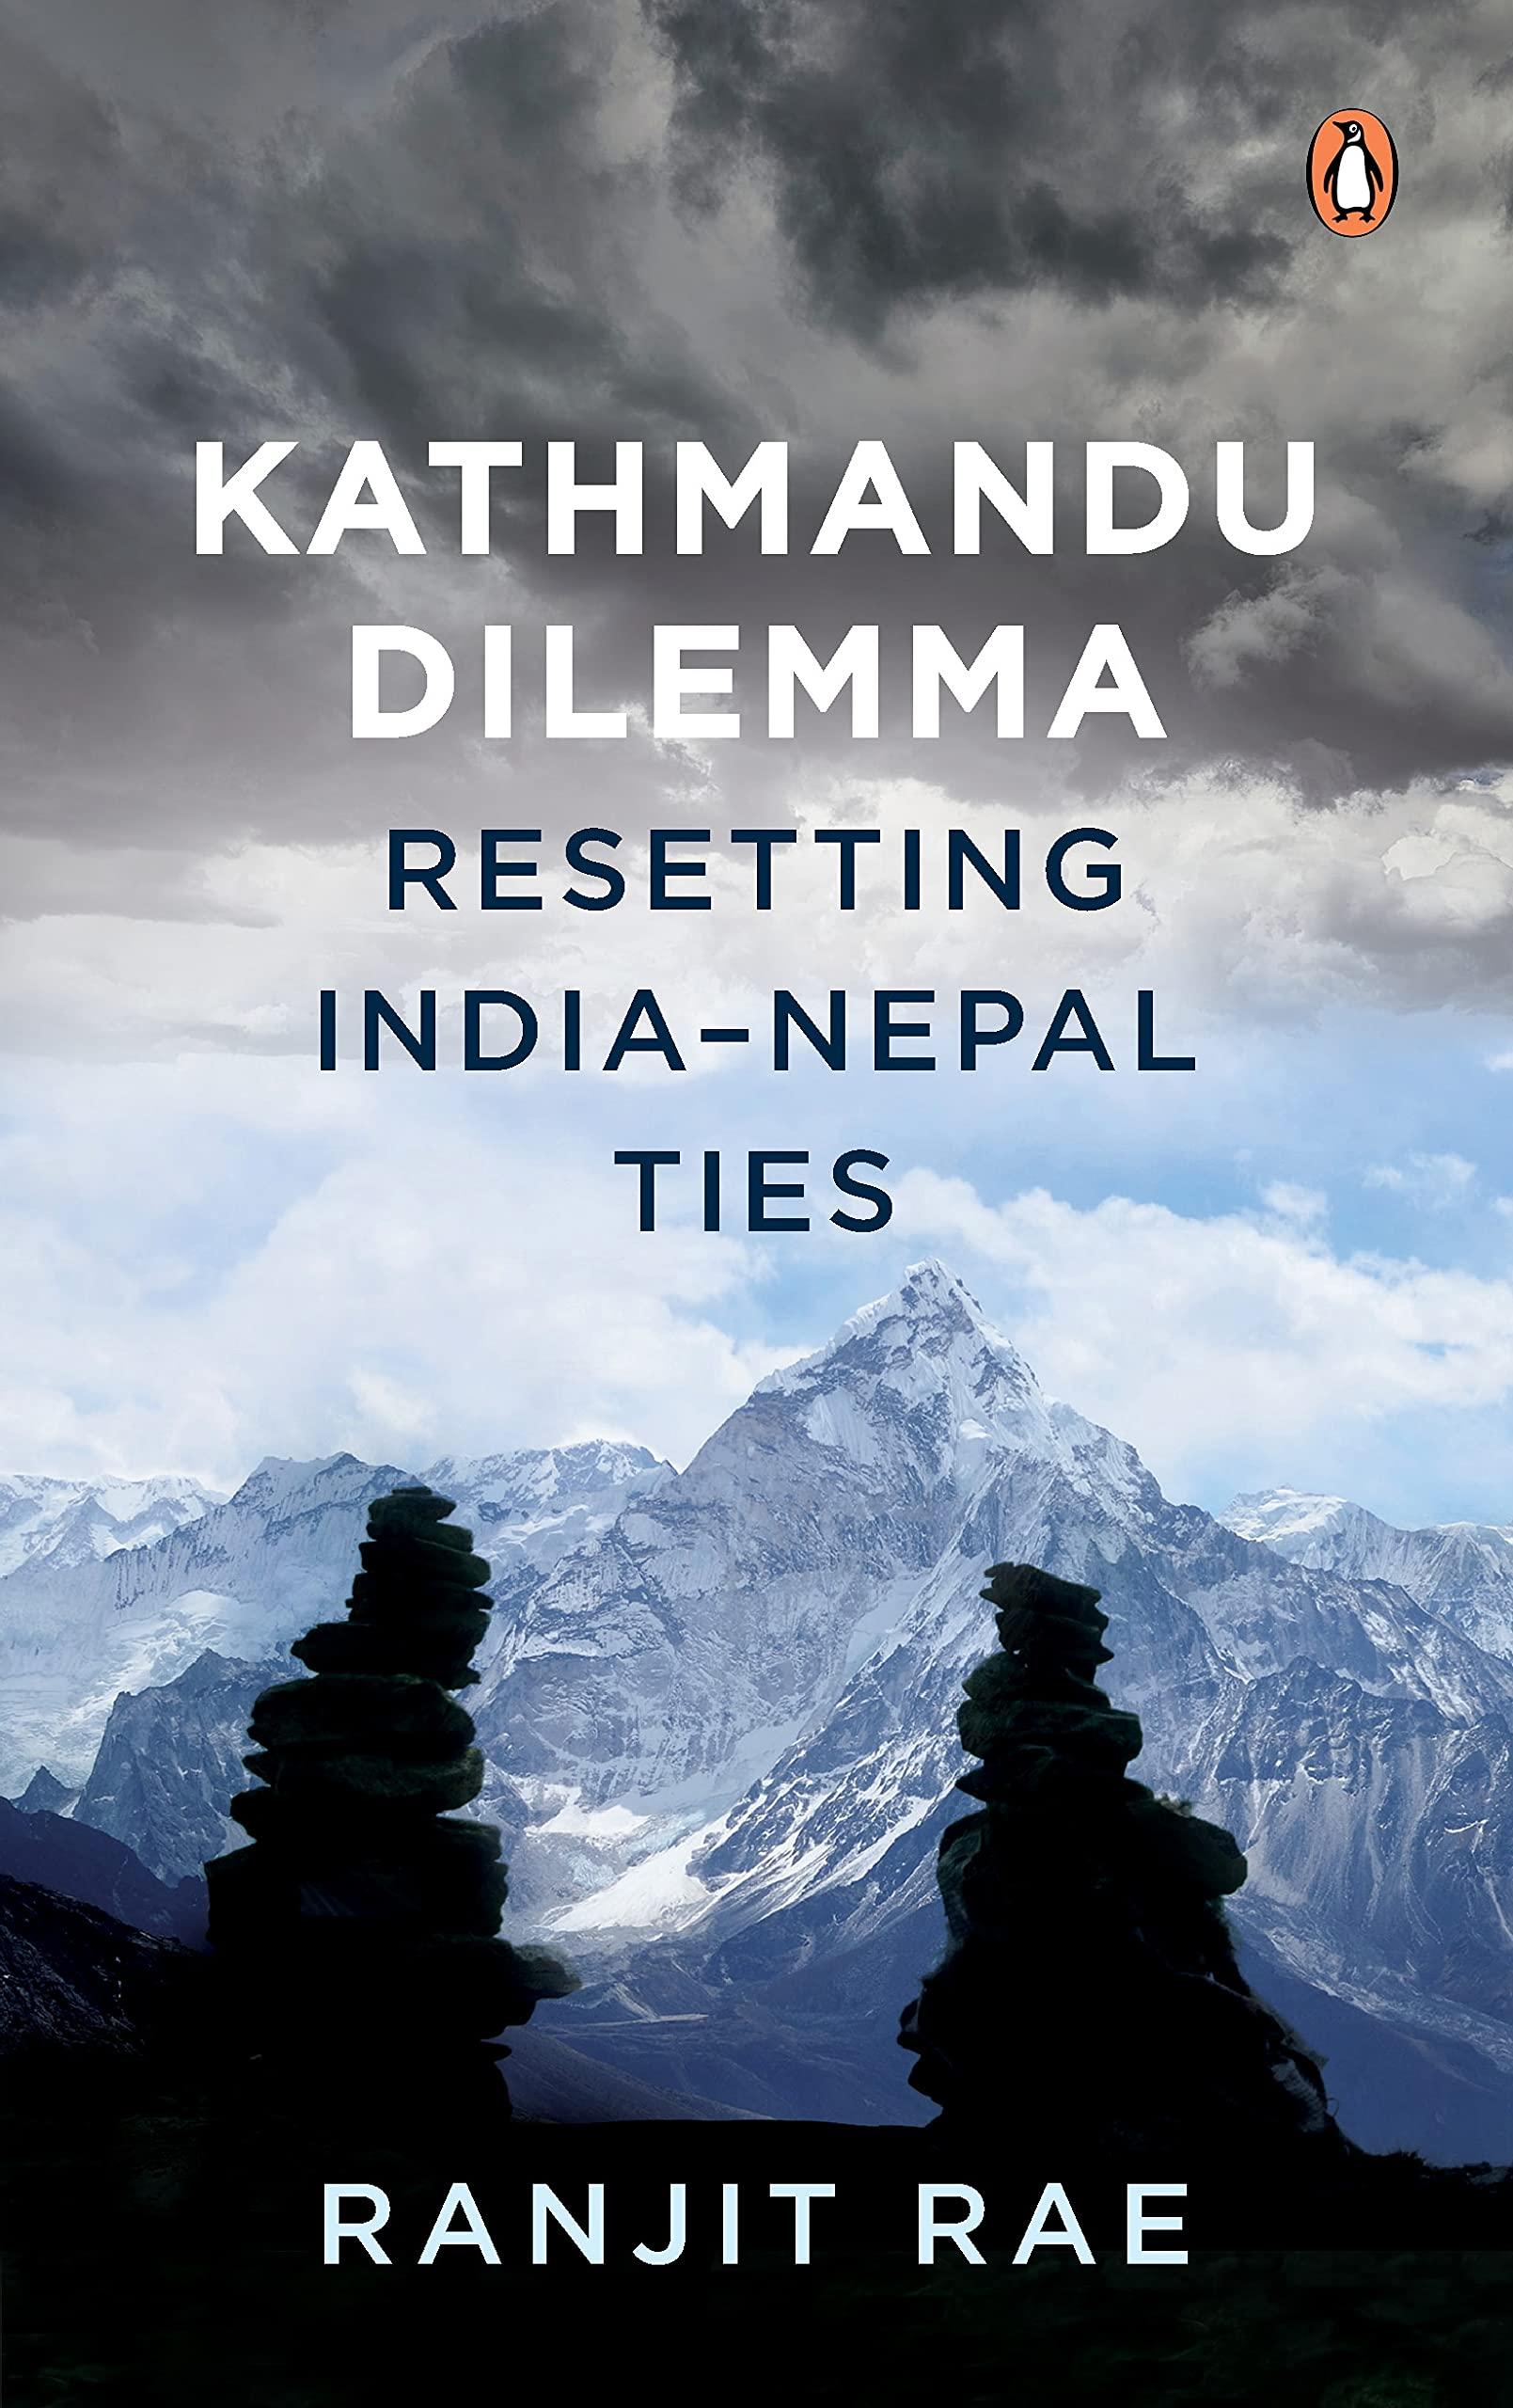 Kathmandu Dilemma: Resetting India-Nepal ties